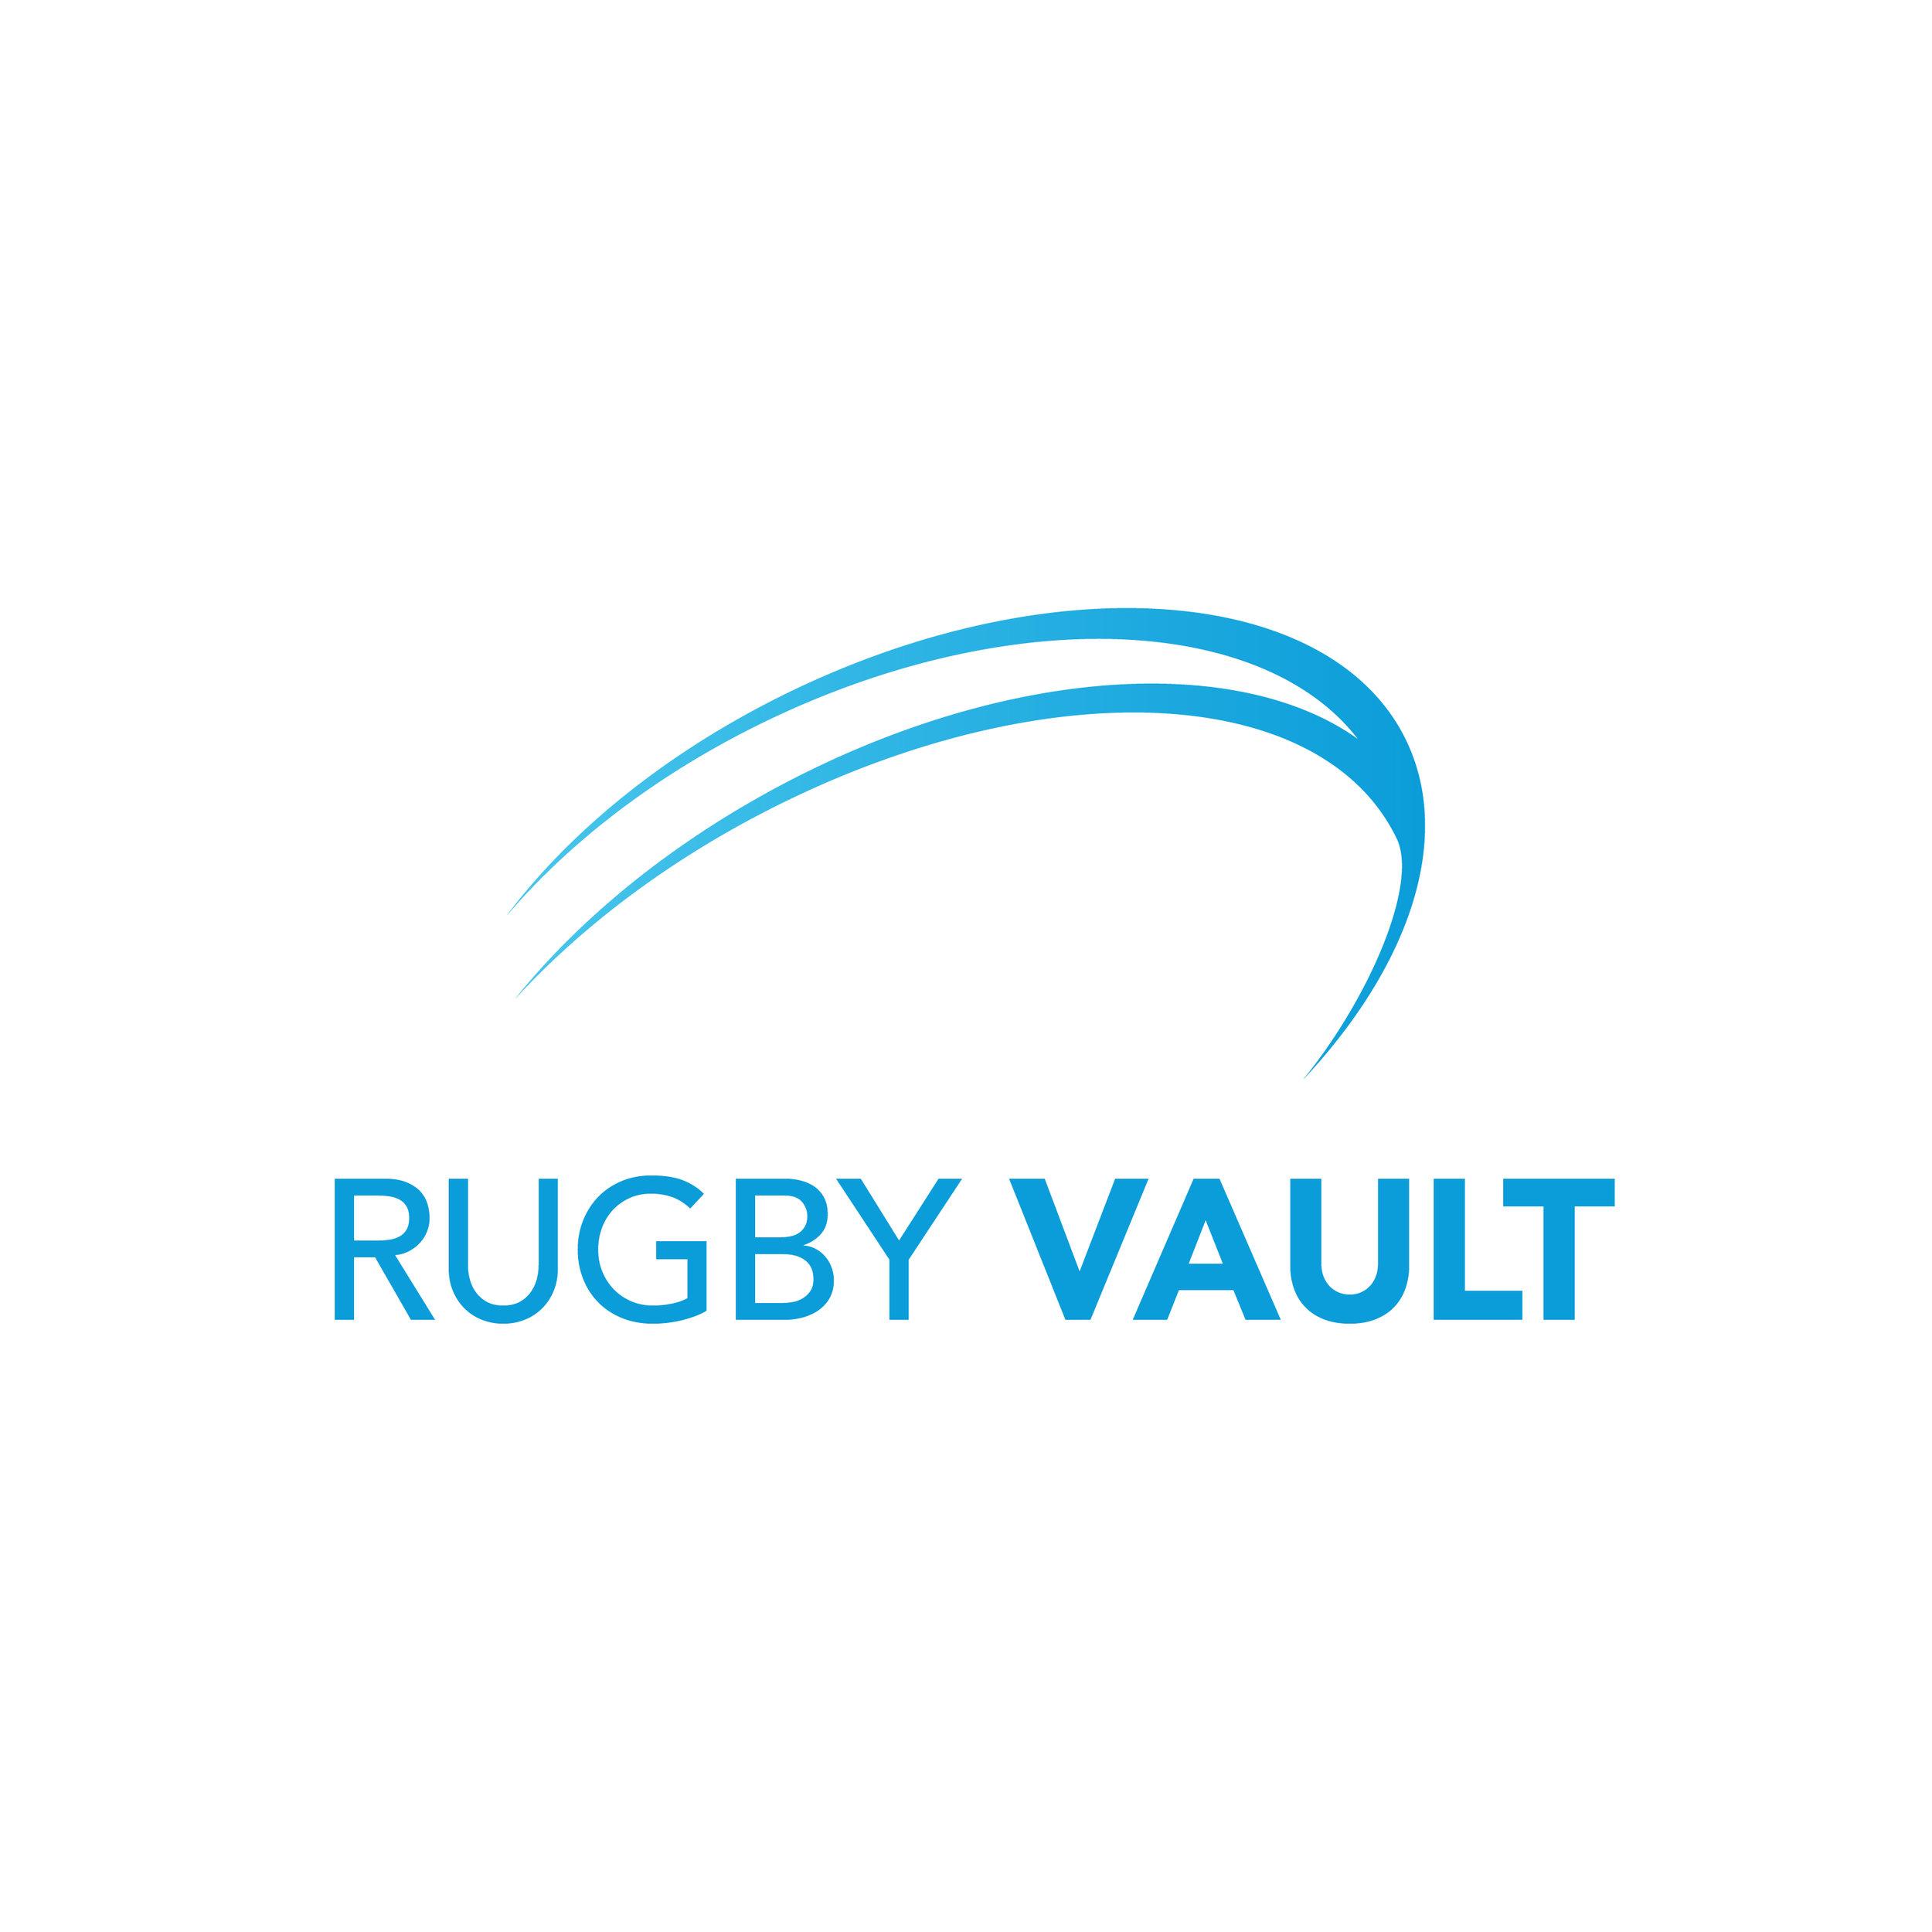 Rugby Vault.jpg